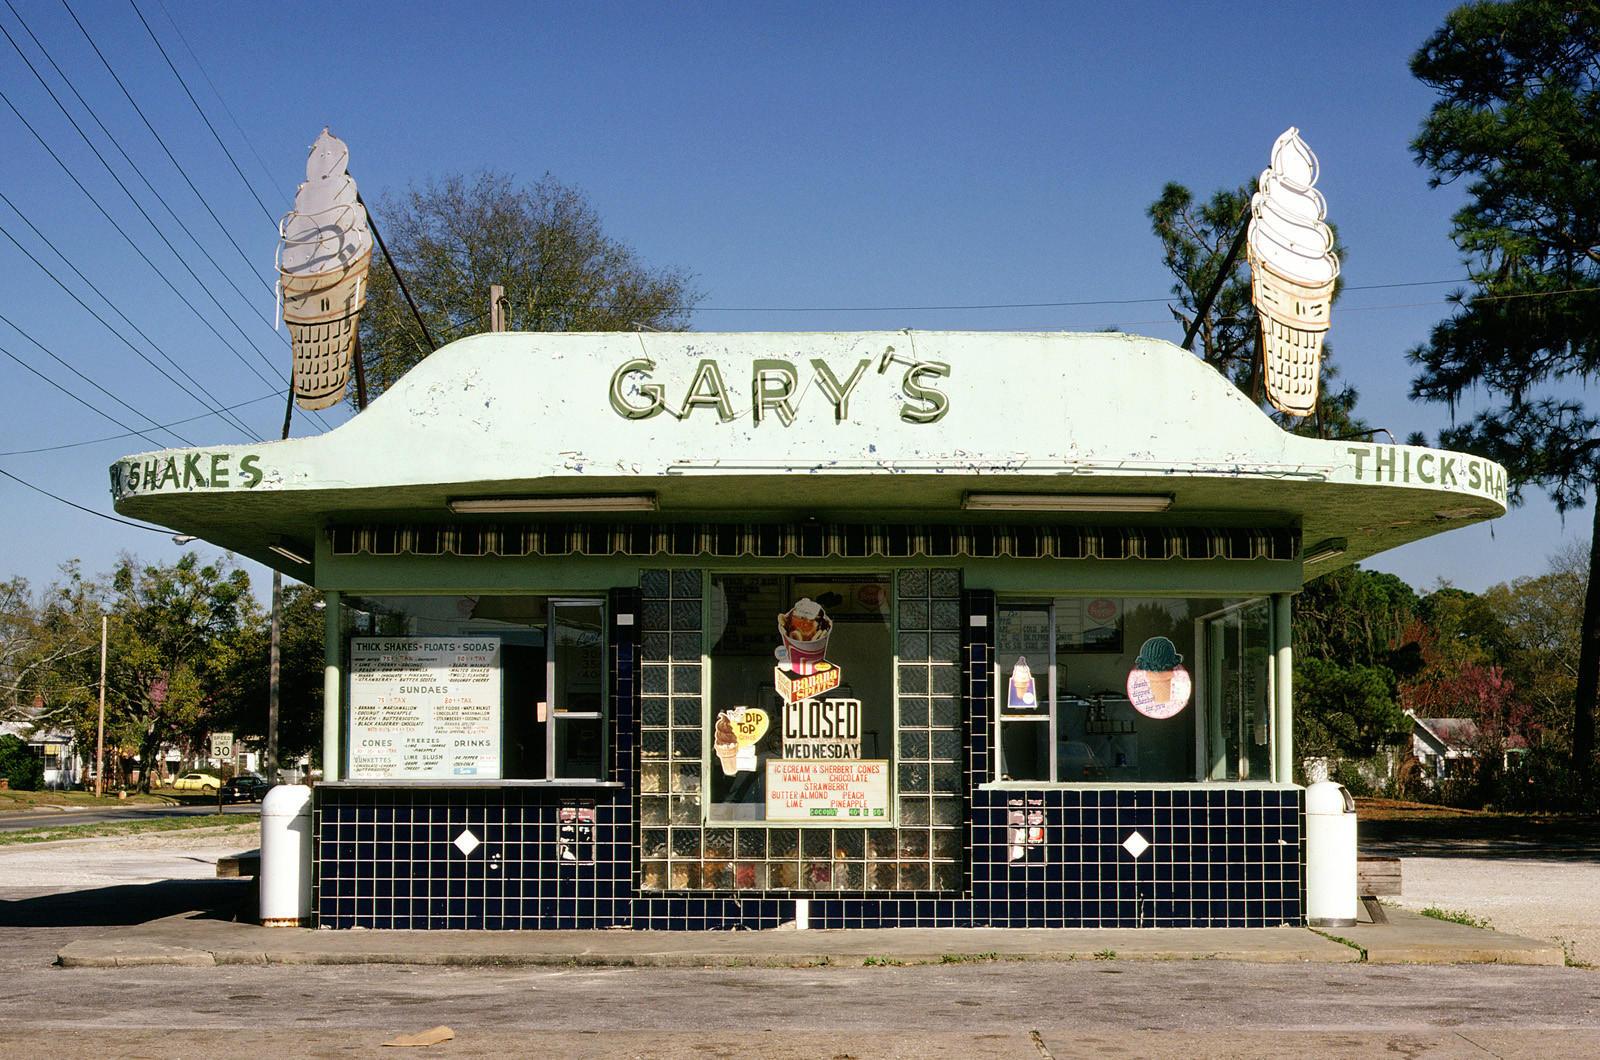 Gary's Thick Shakes, Jacksonville, Fla.